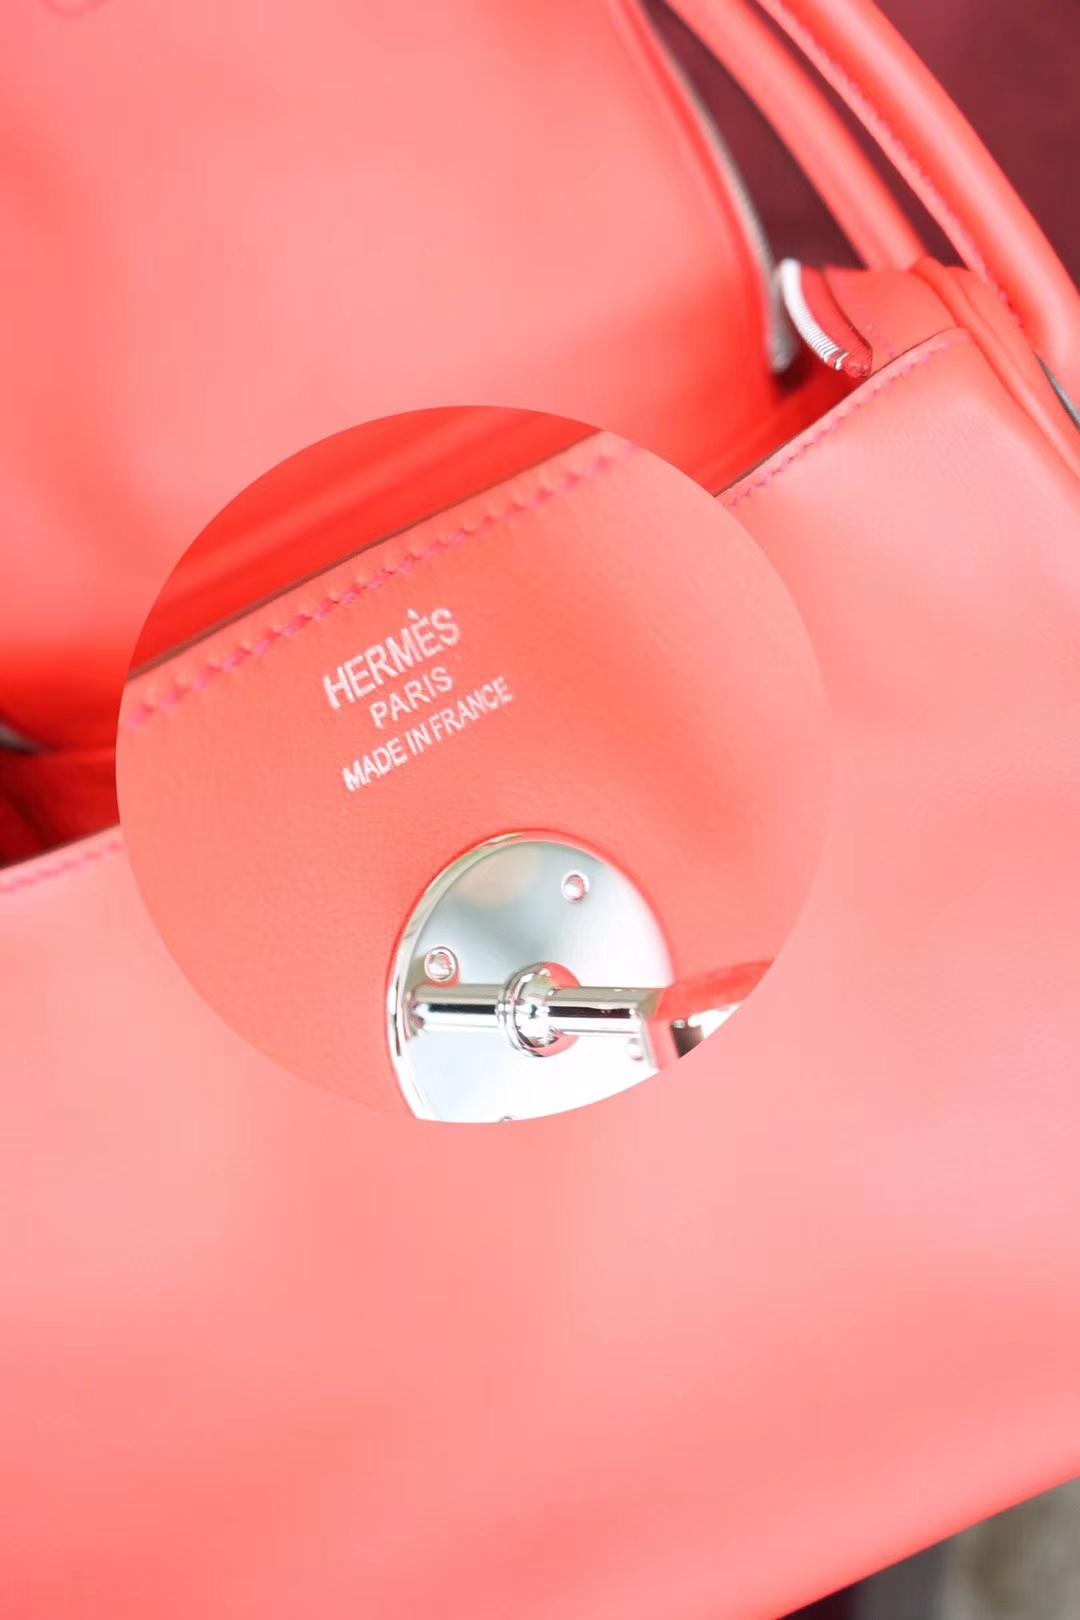 Hermès(爱马仕)Lindy 琳迪包 朱砂红 编织肩带 原厂御用swift皮 银扣 26cm